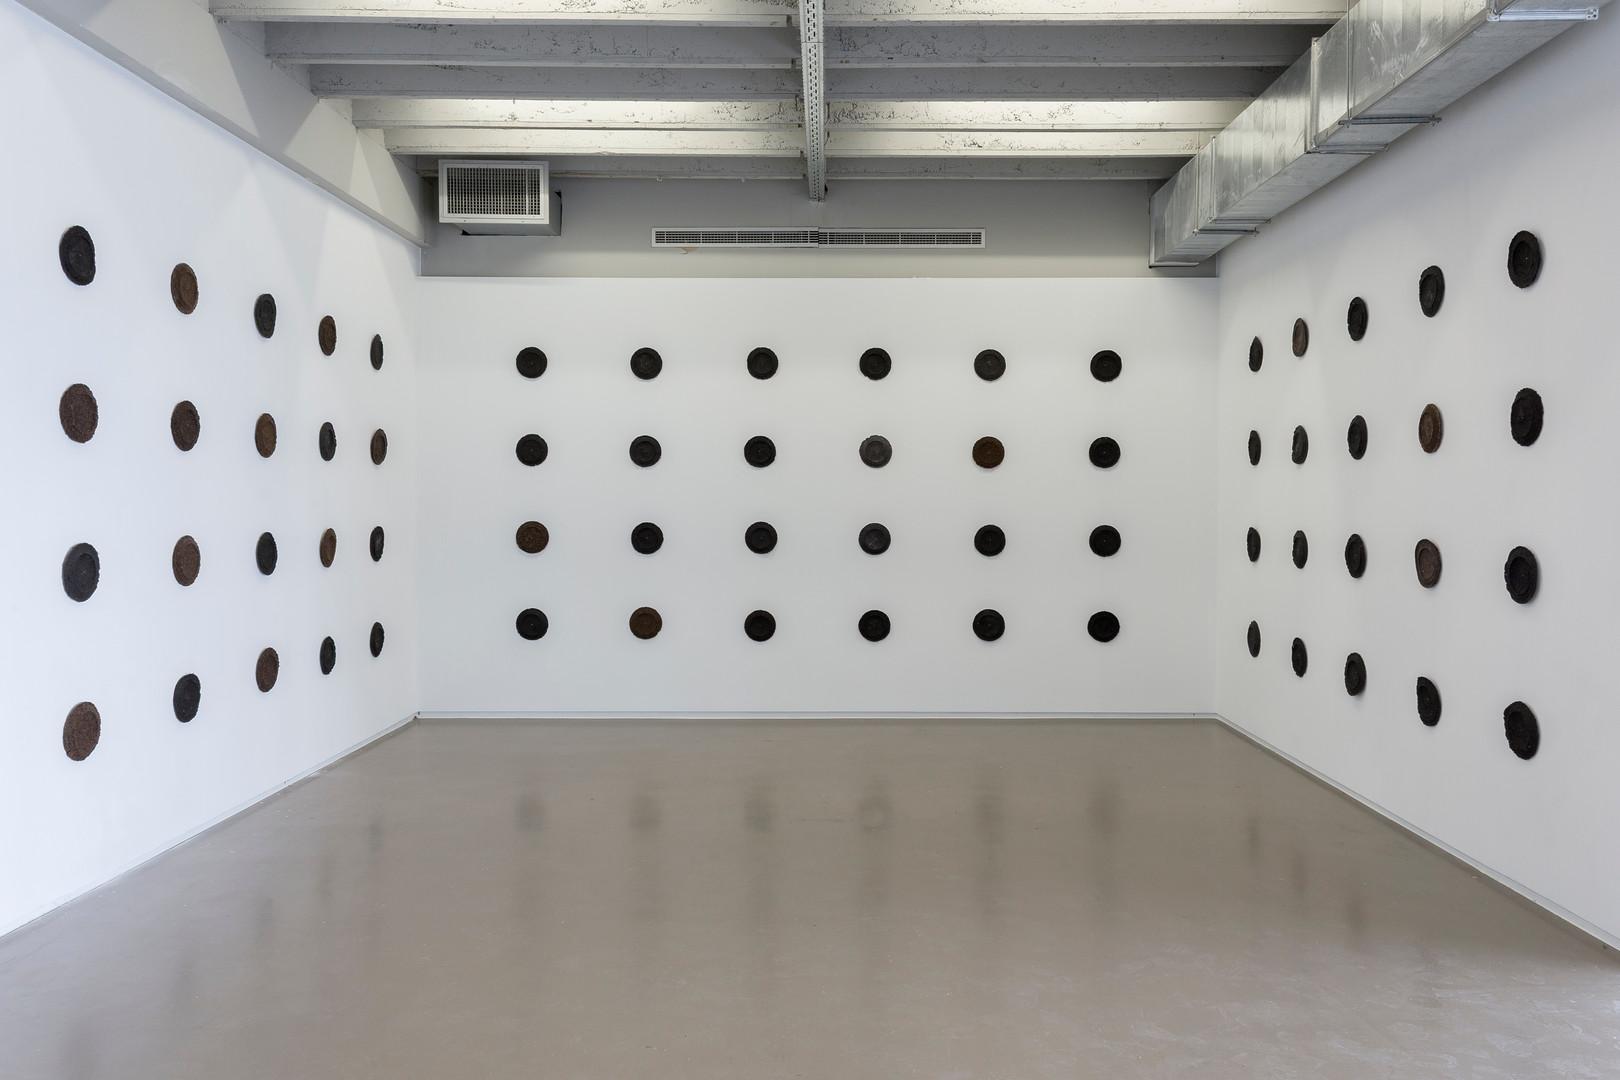 lixi-alexis-dauw-oeuvre-d-art-contempora